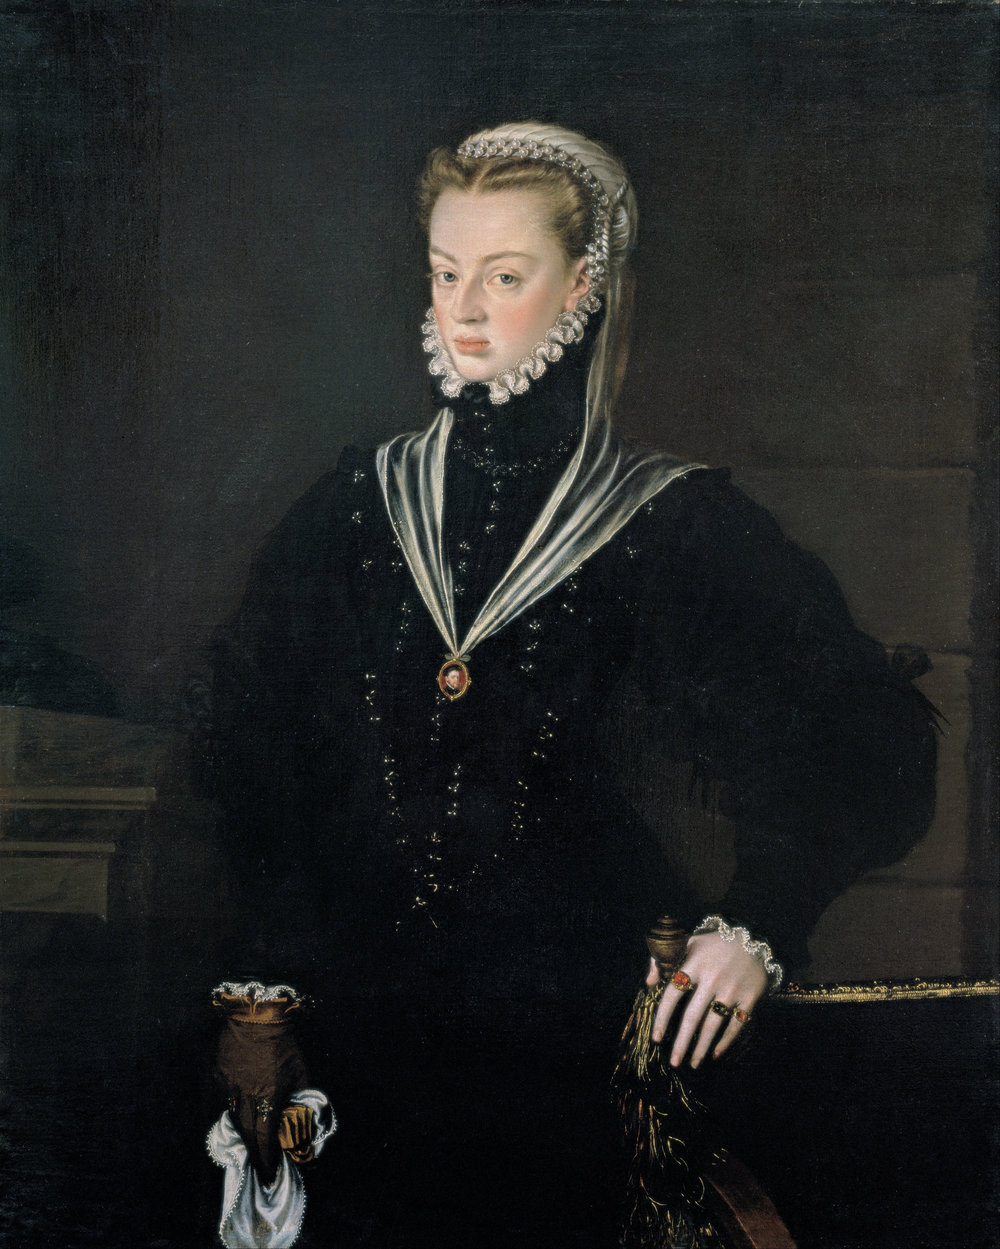 Portrait of Juana by Alonso Sánchez Coello, c. 1557.